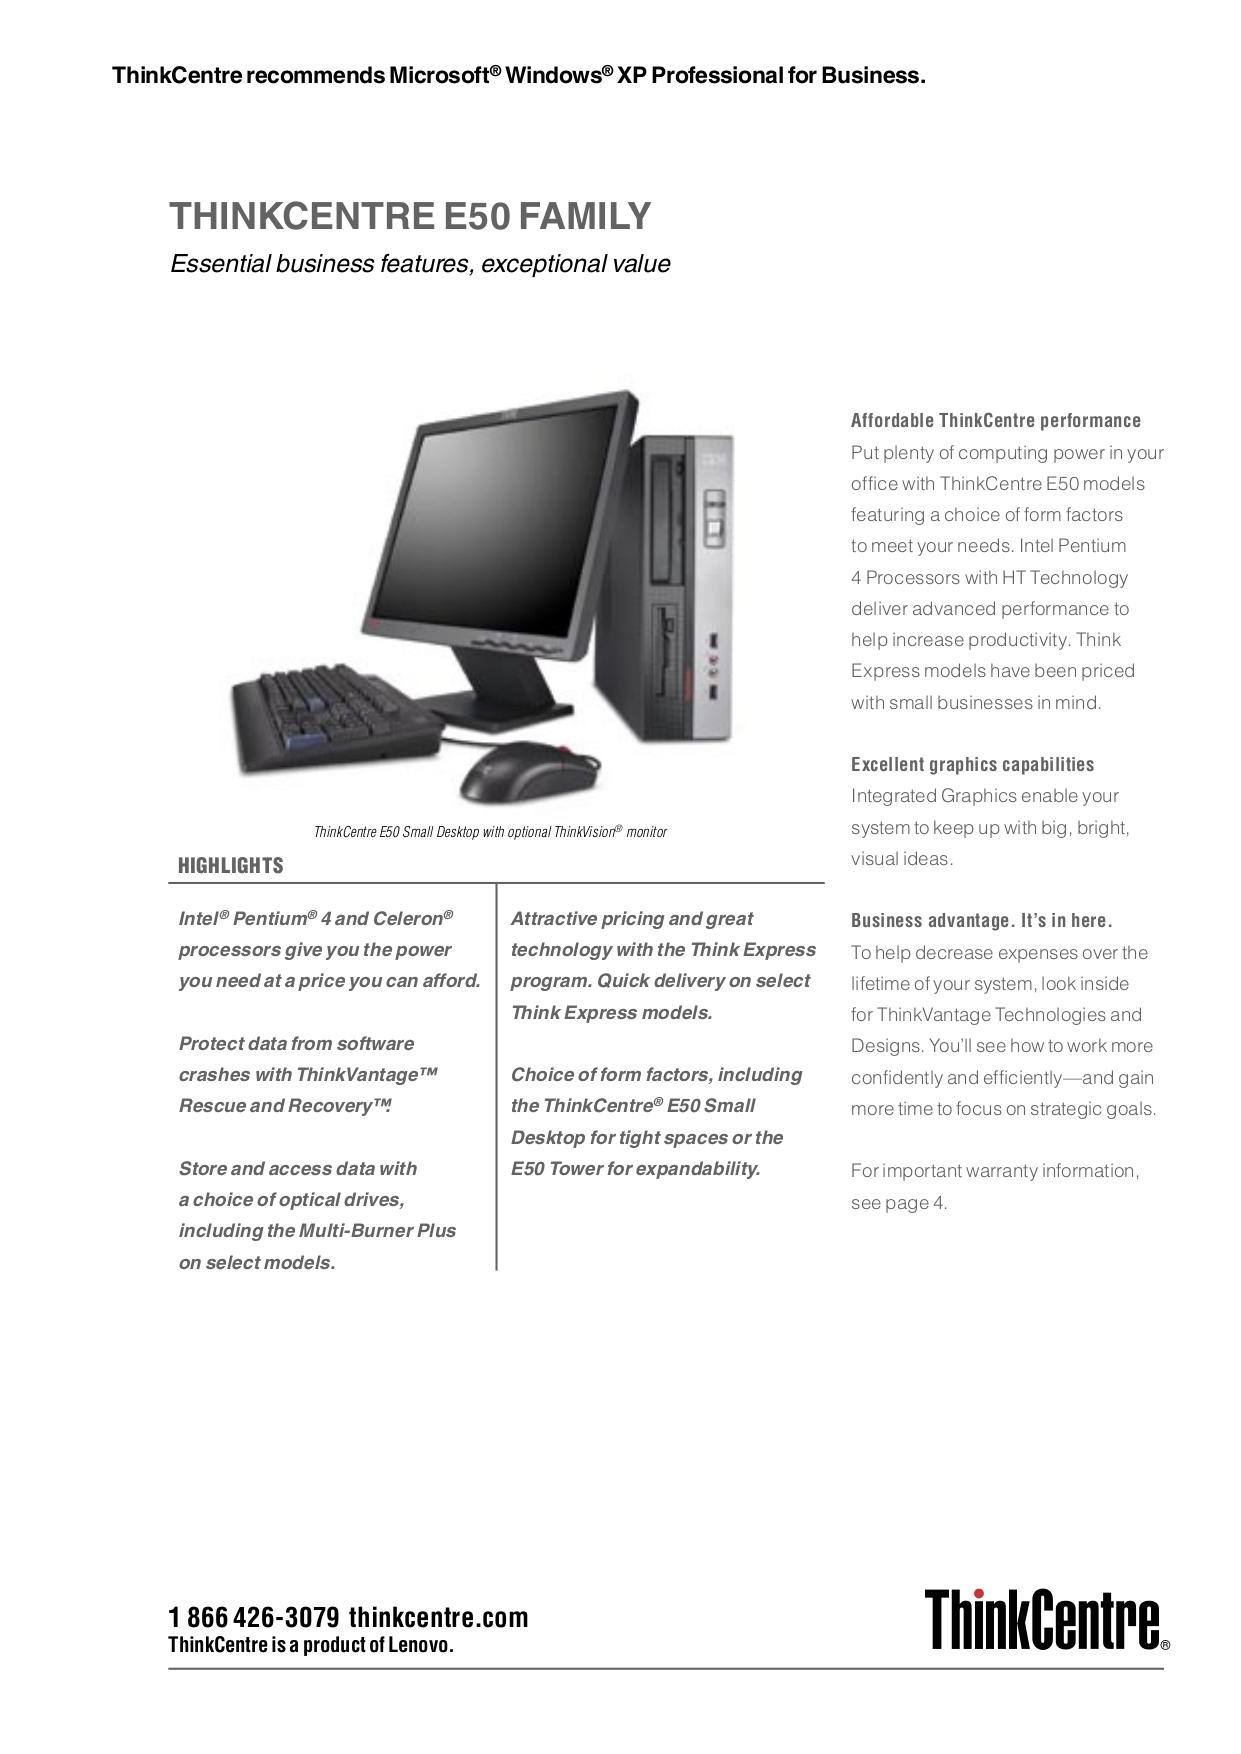 pdf for Lenovo Desktop ThinkCentre E50 8293 manual